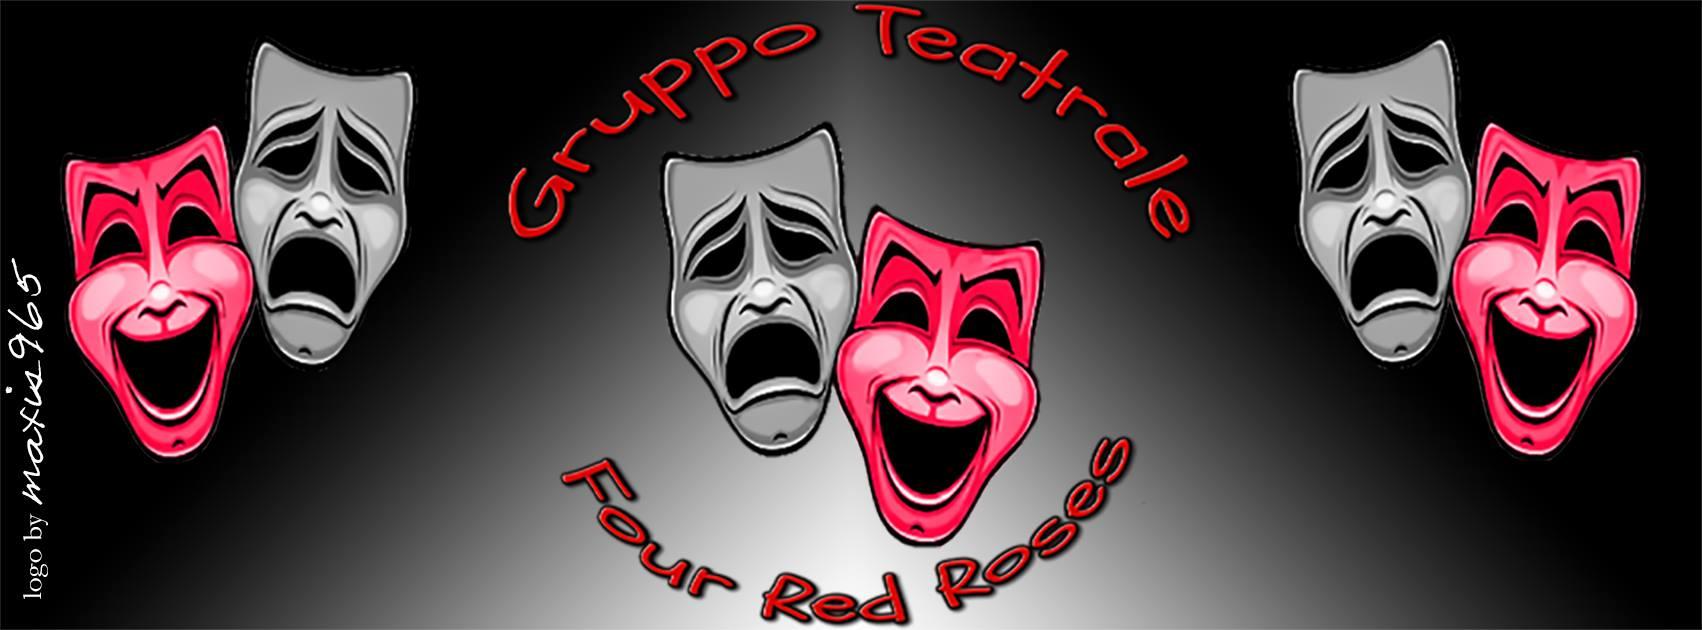 Gruppo Teatrale Four Red Roses